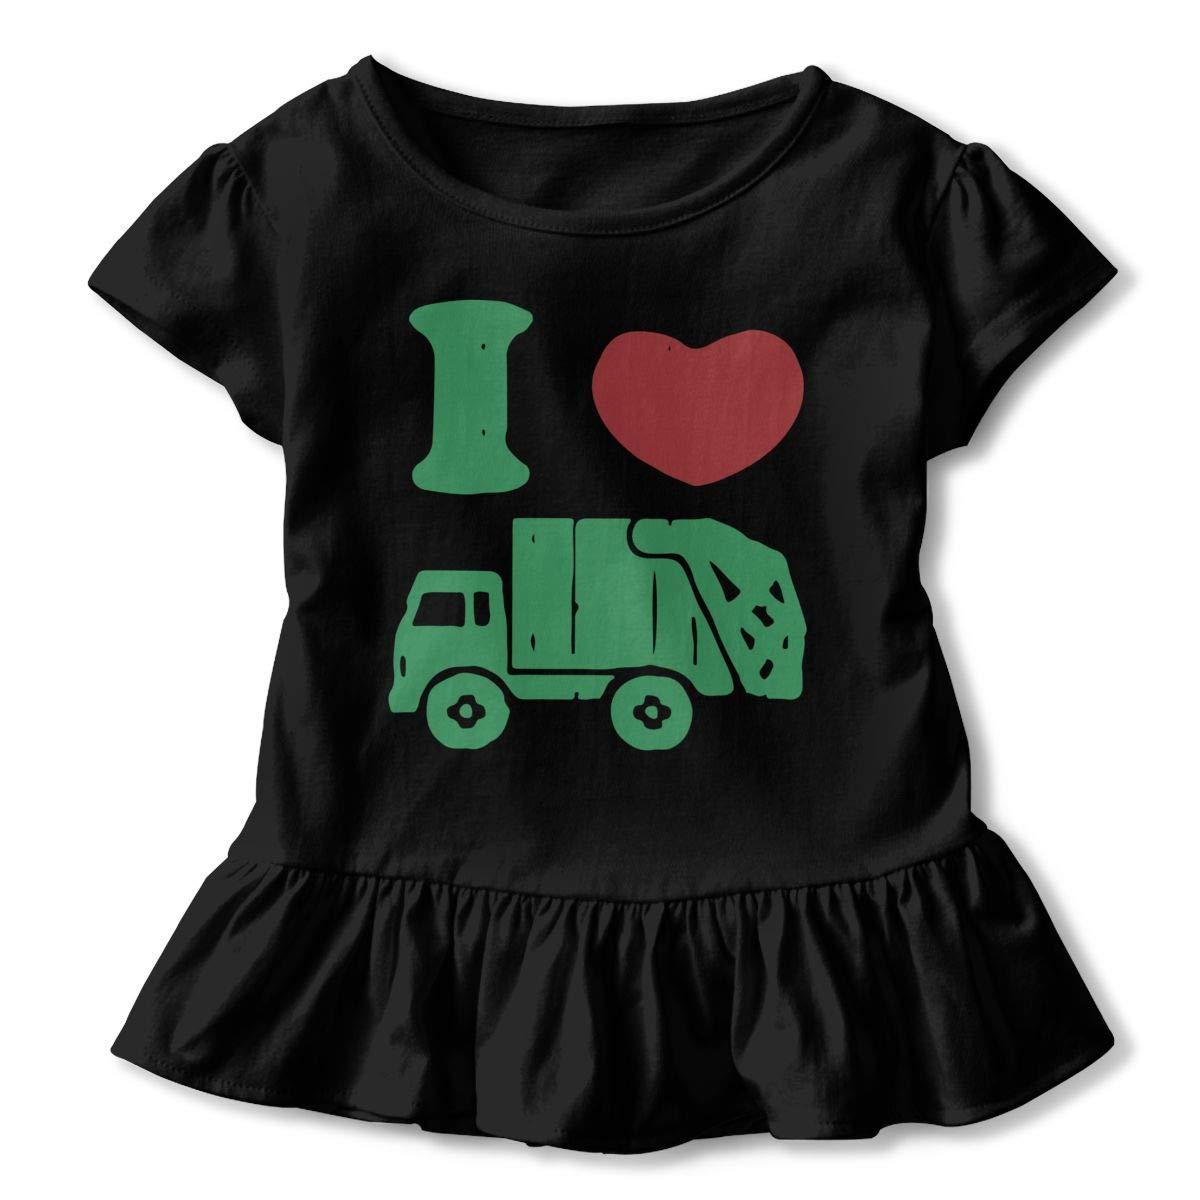 I Love Trash Garbage Trucks Baby Girls Short Sleeve Ruffles T-Shirt Tops 2-Pack Cotton Tee